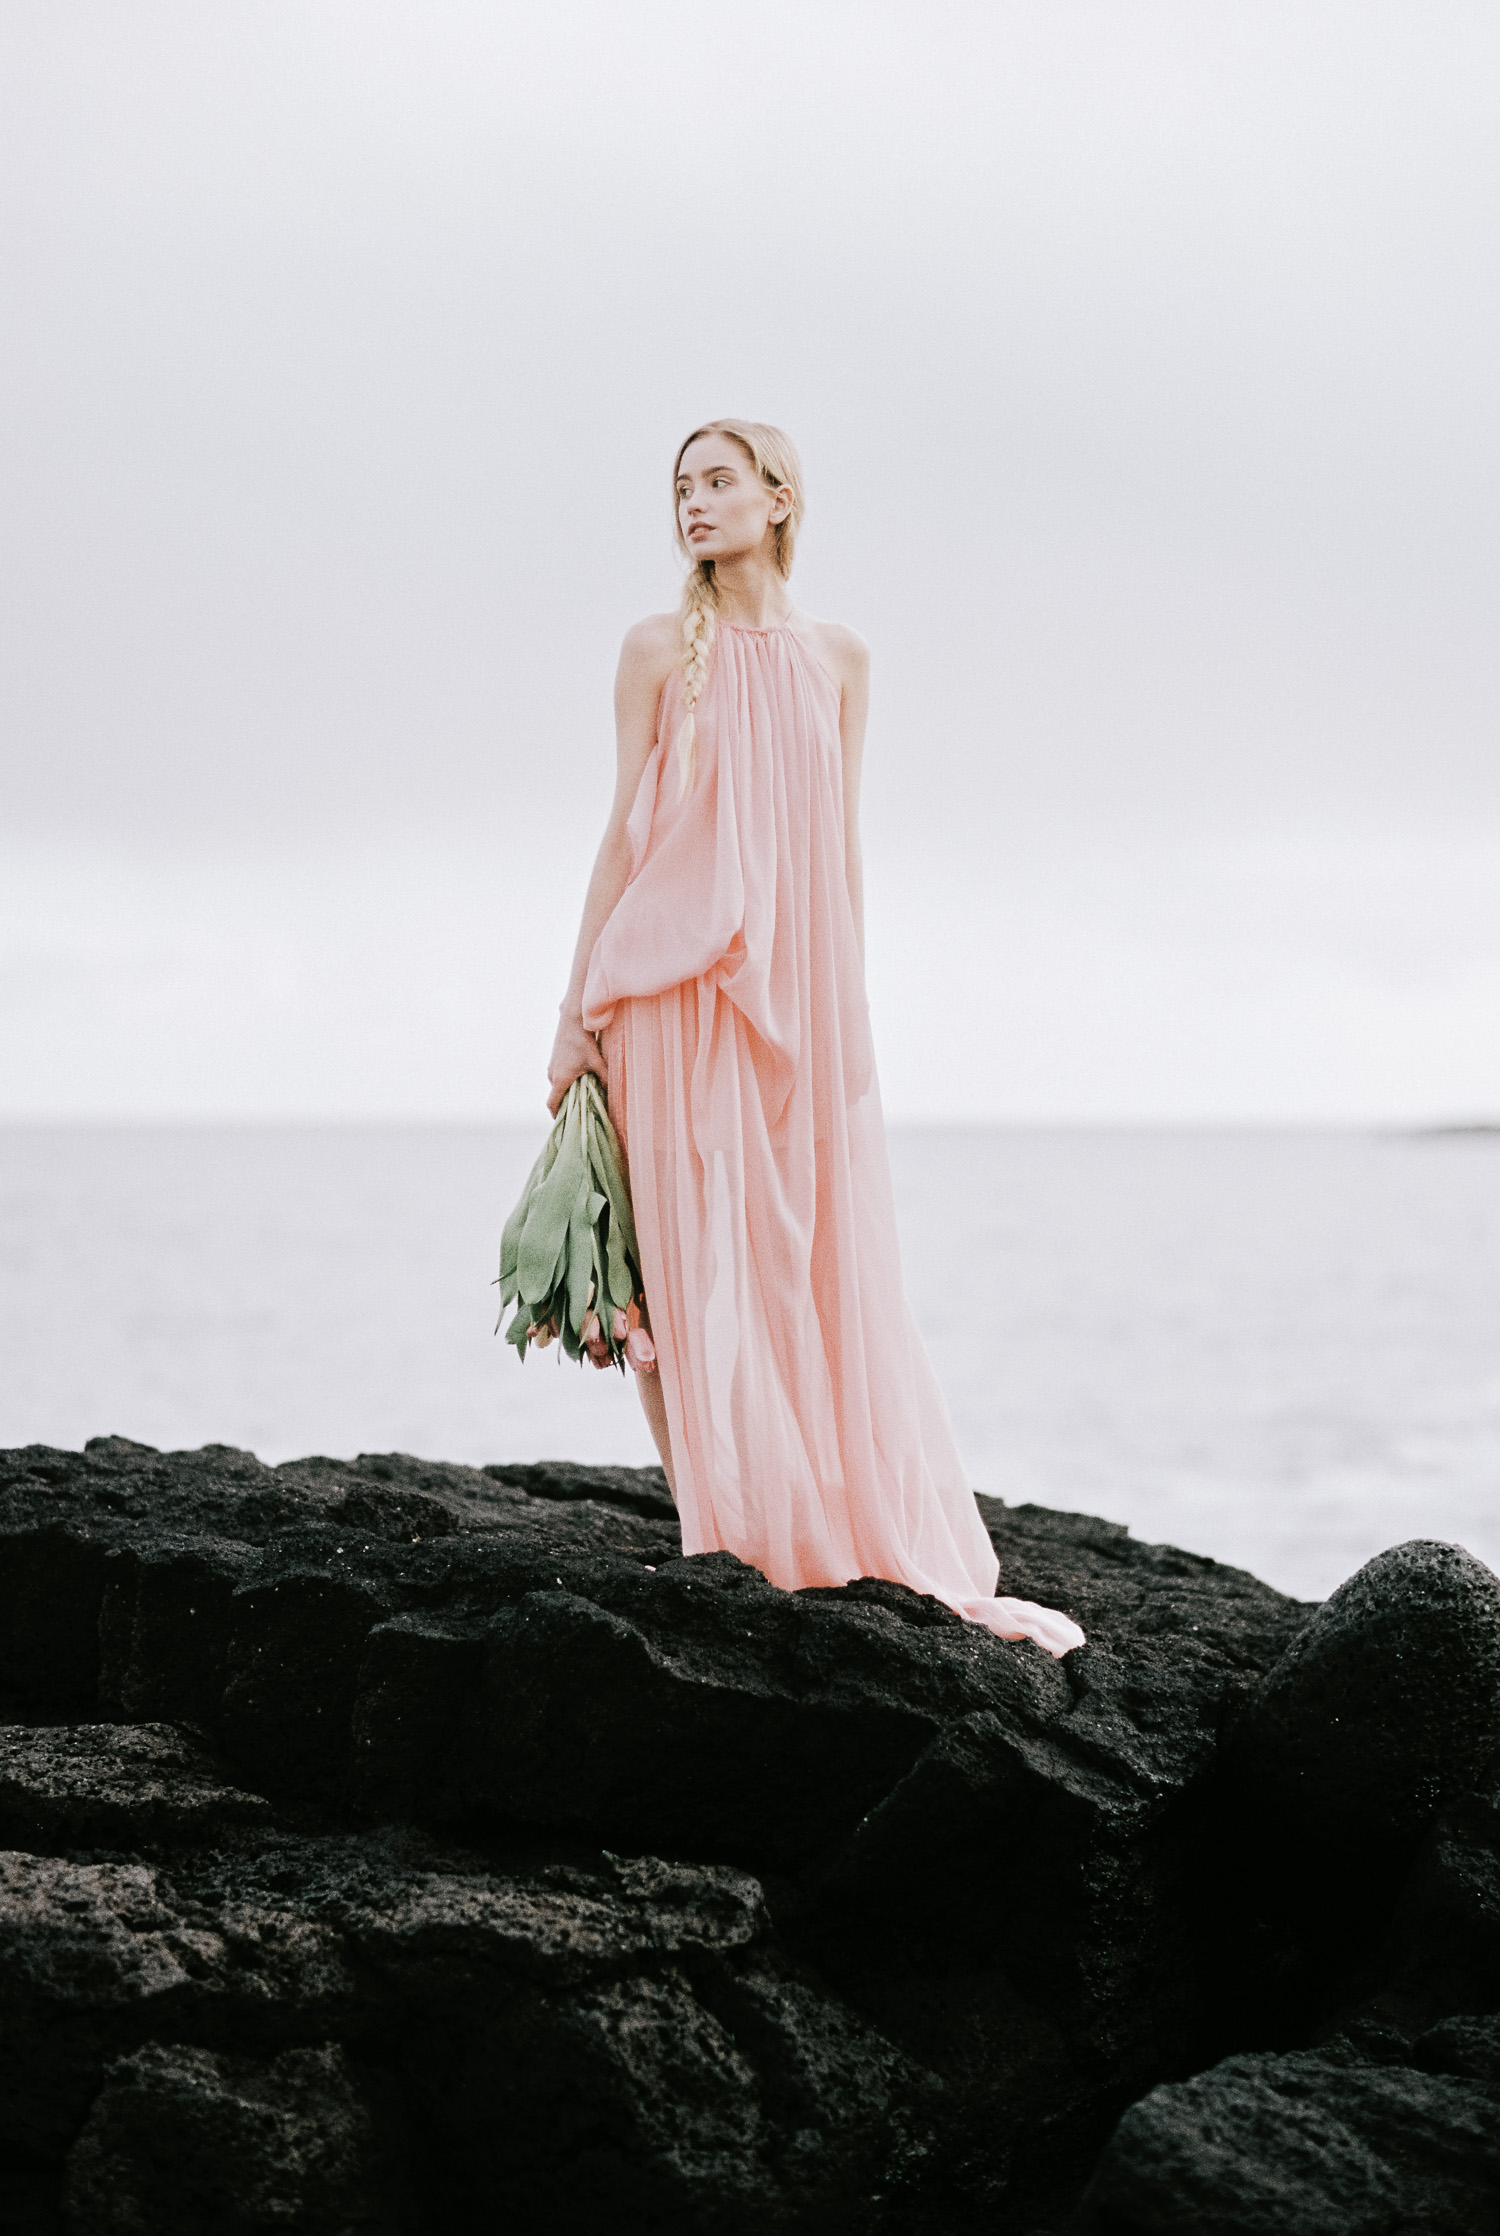 025-Budir-Wedding- Photographer-Iceland Bridal-70.jpg